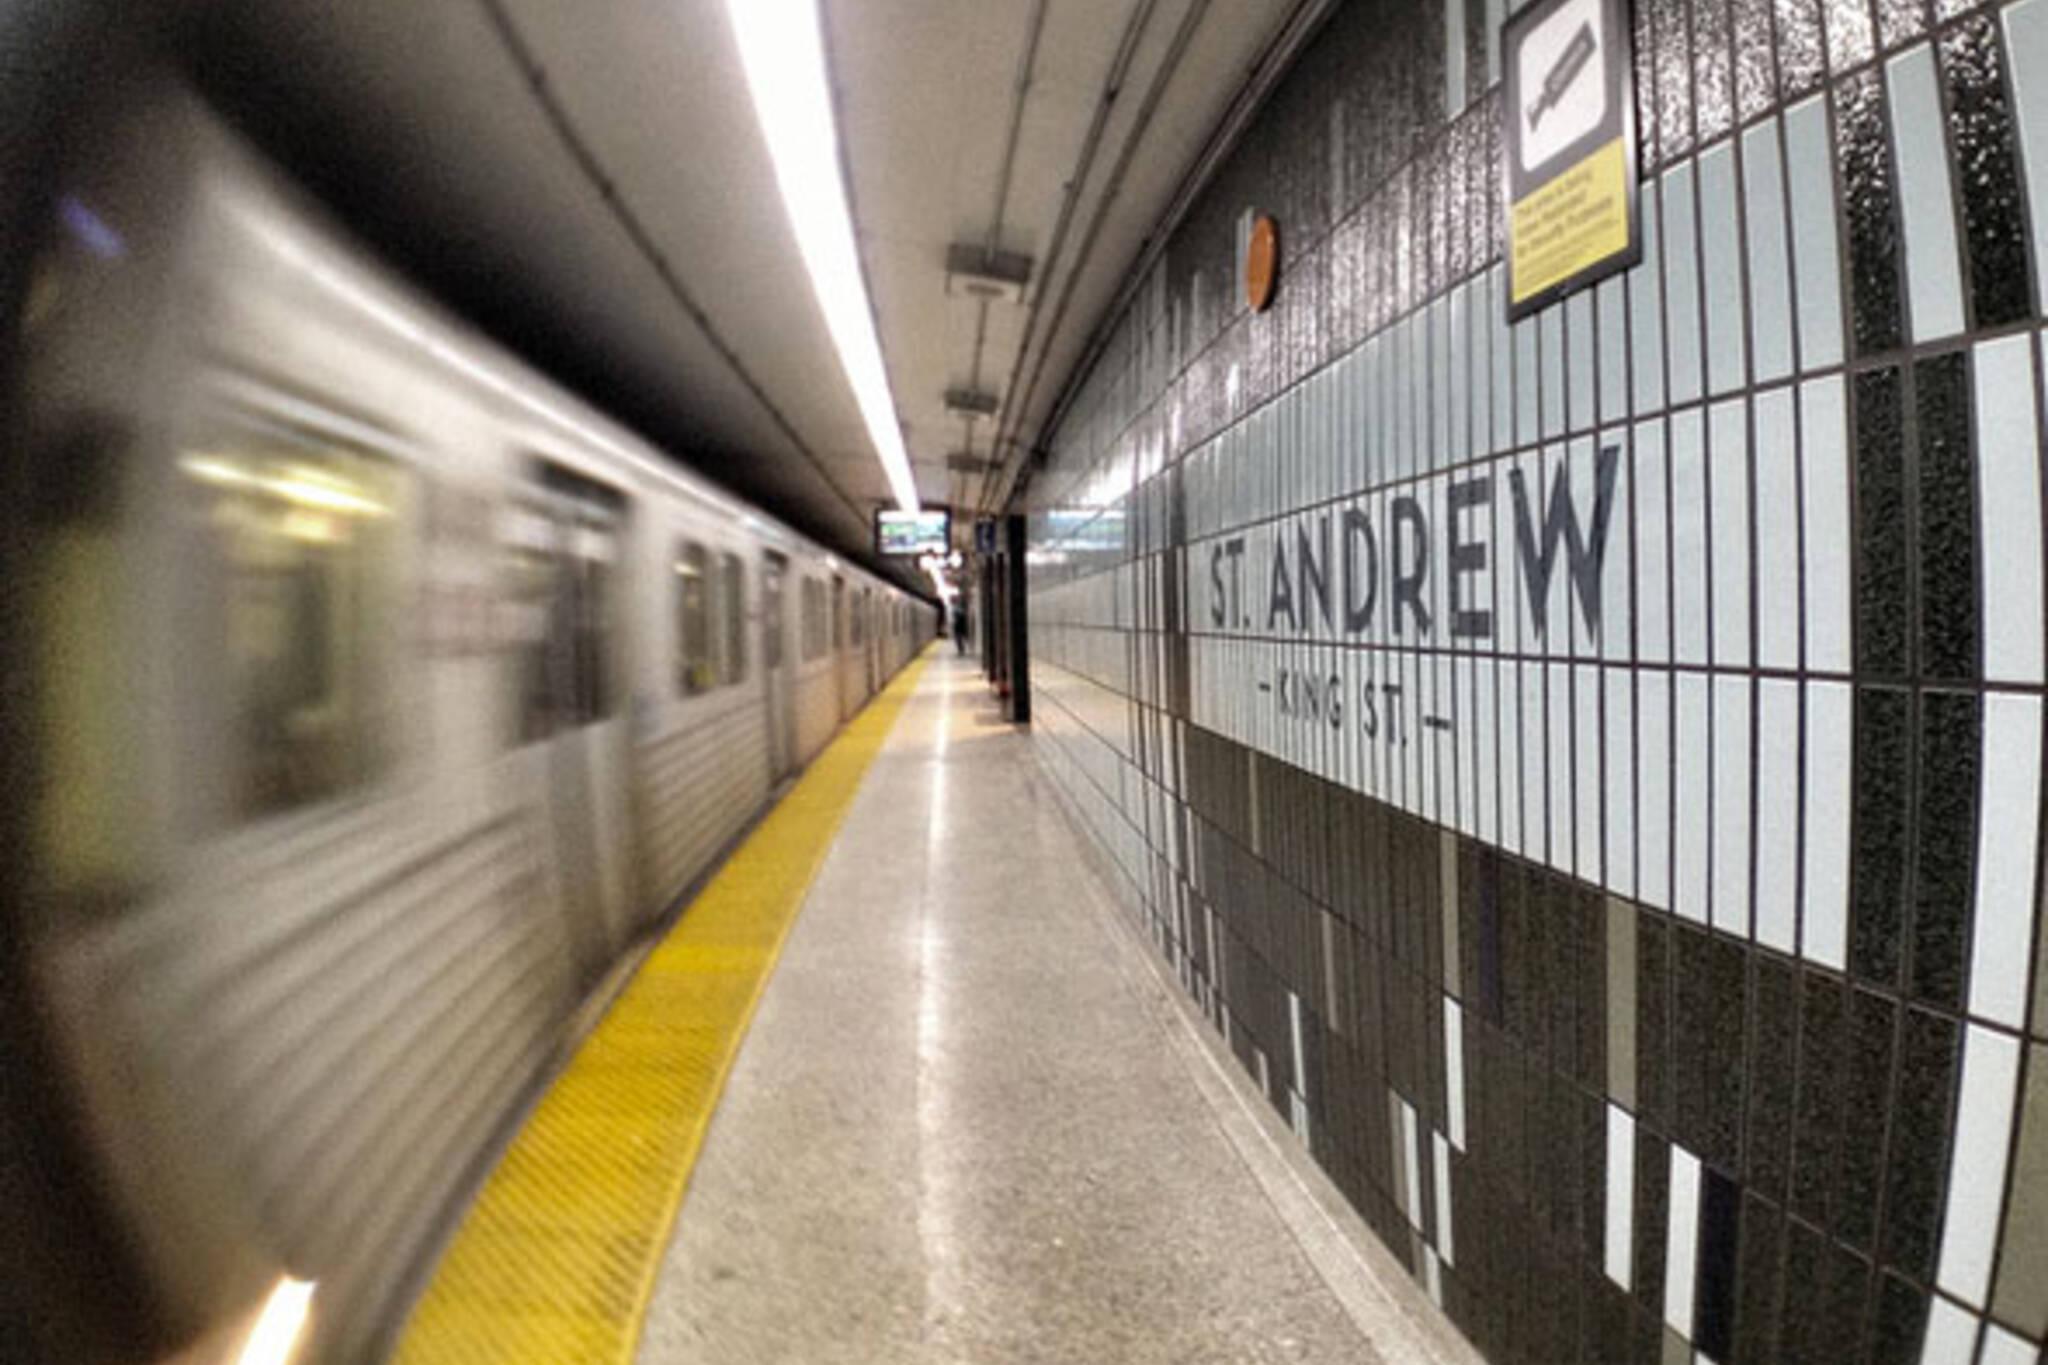 toronto st andrew station